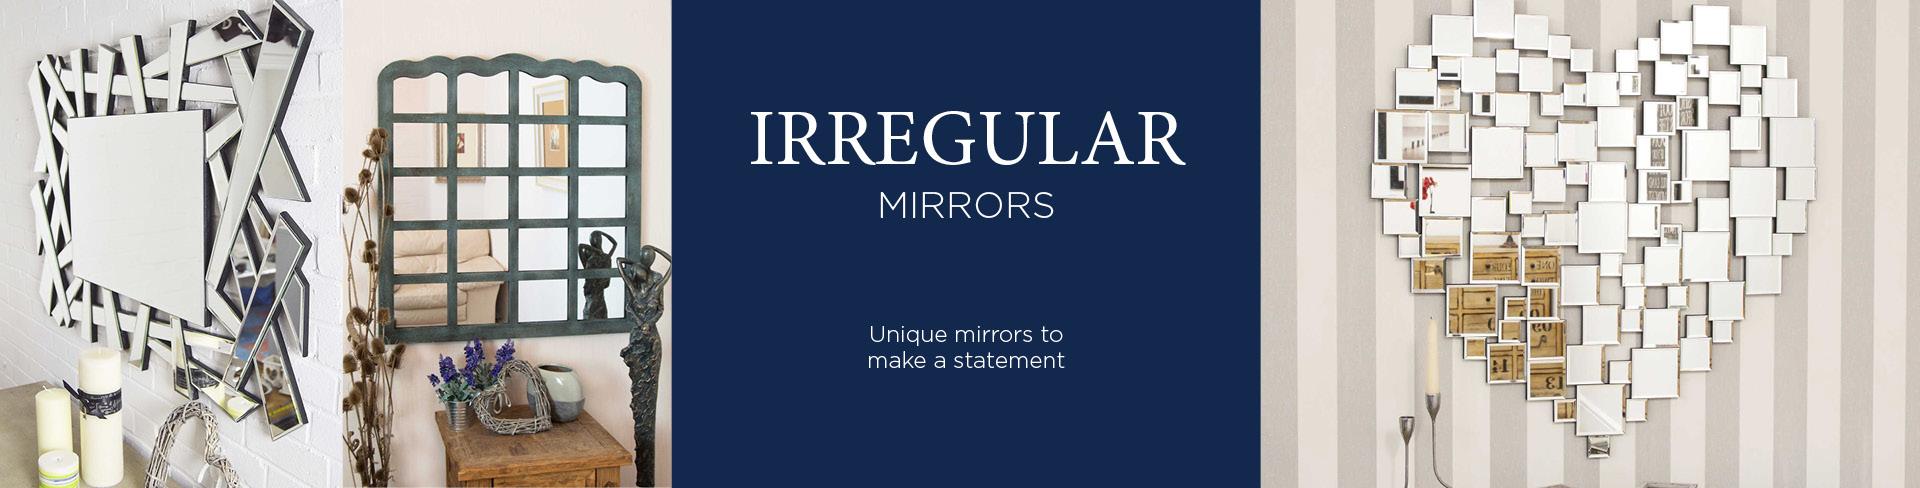 Irregular Mirrors